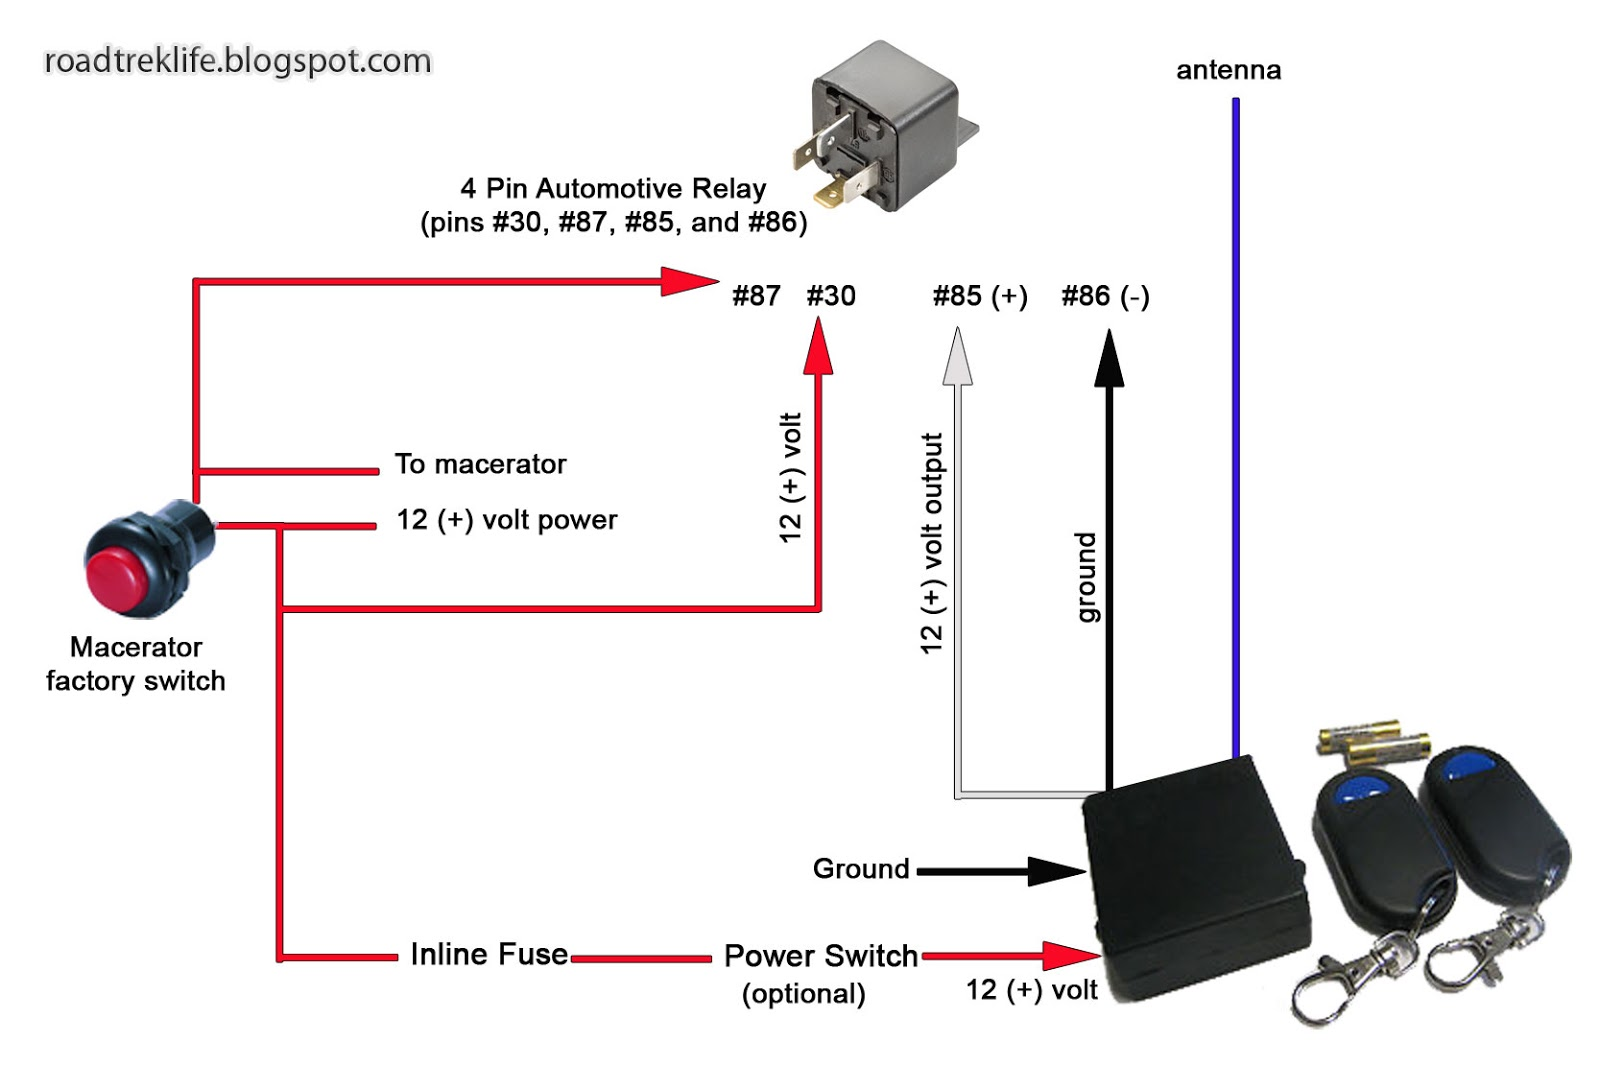 hight resolution of wiring diagram roadtrek e trek wiring diagram used wiring diagram roadtrek e trek